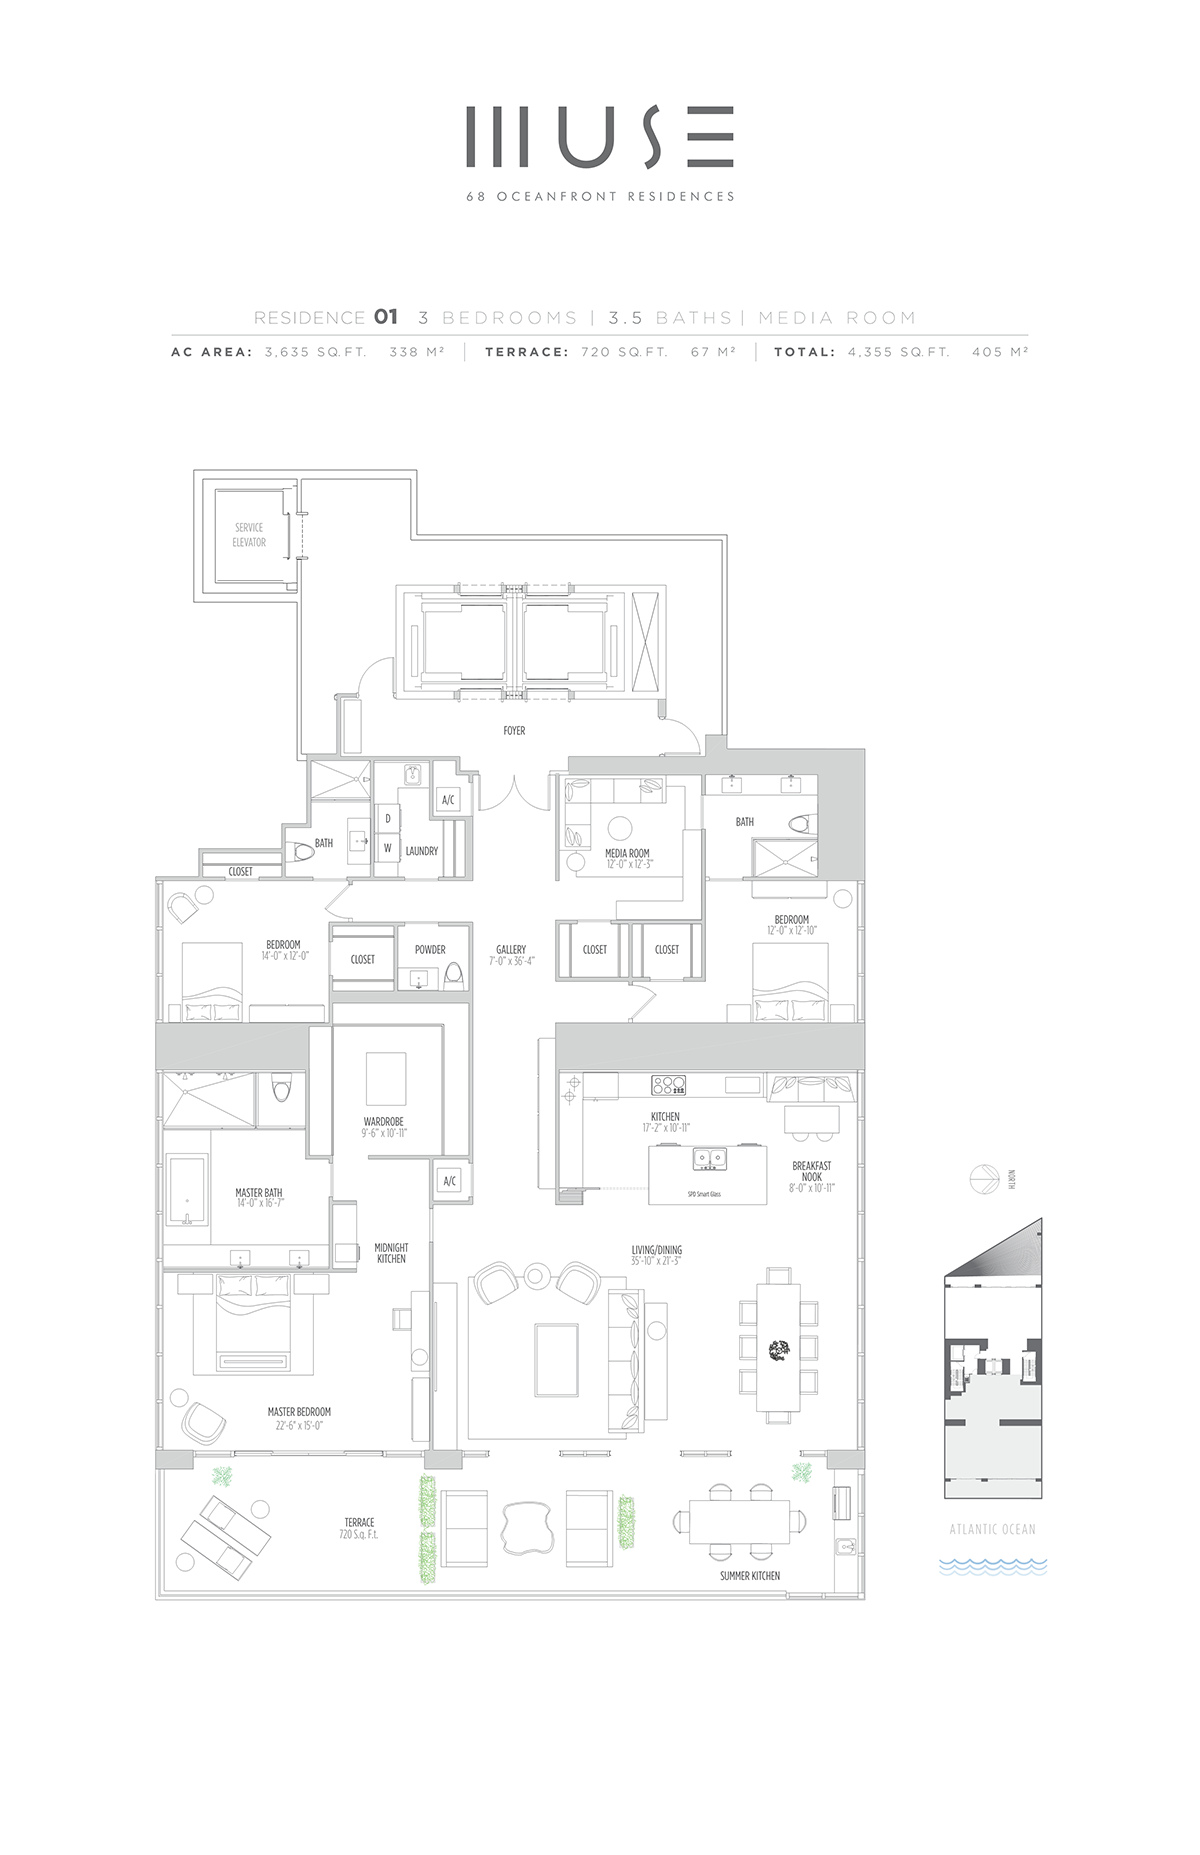 Muse - Floorplan 1